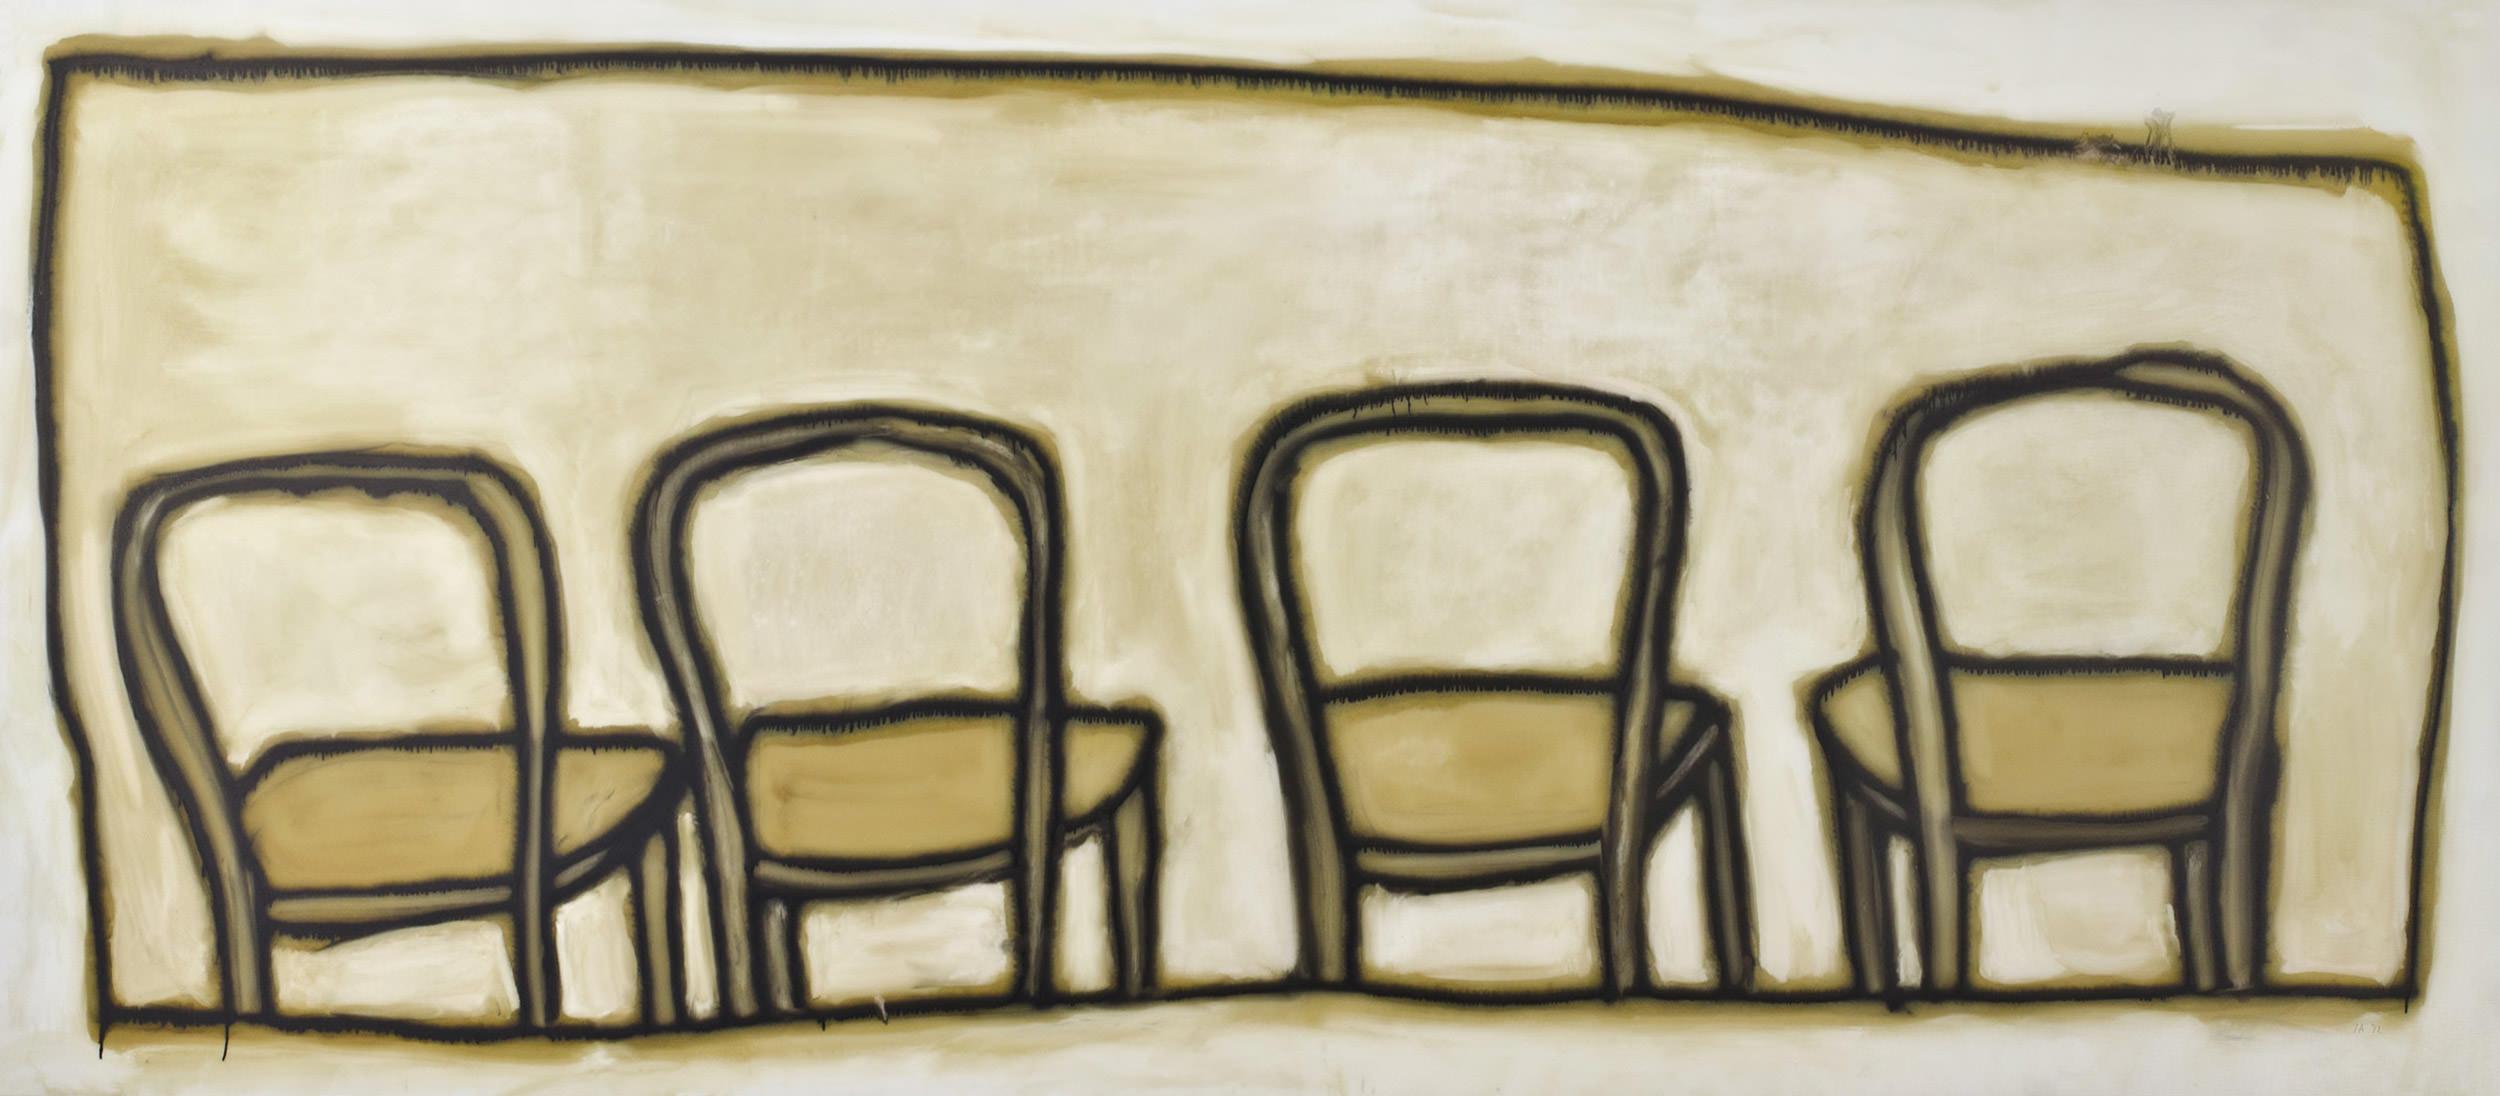 Ida Applebroog, Catastrophe (Chairs), 2012 at ICA Miami